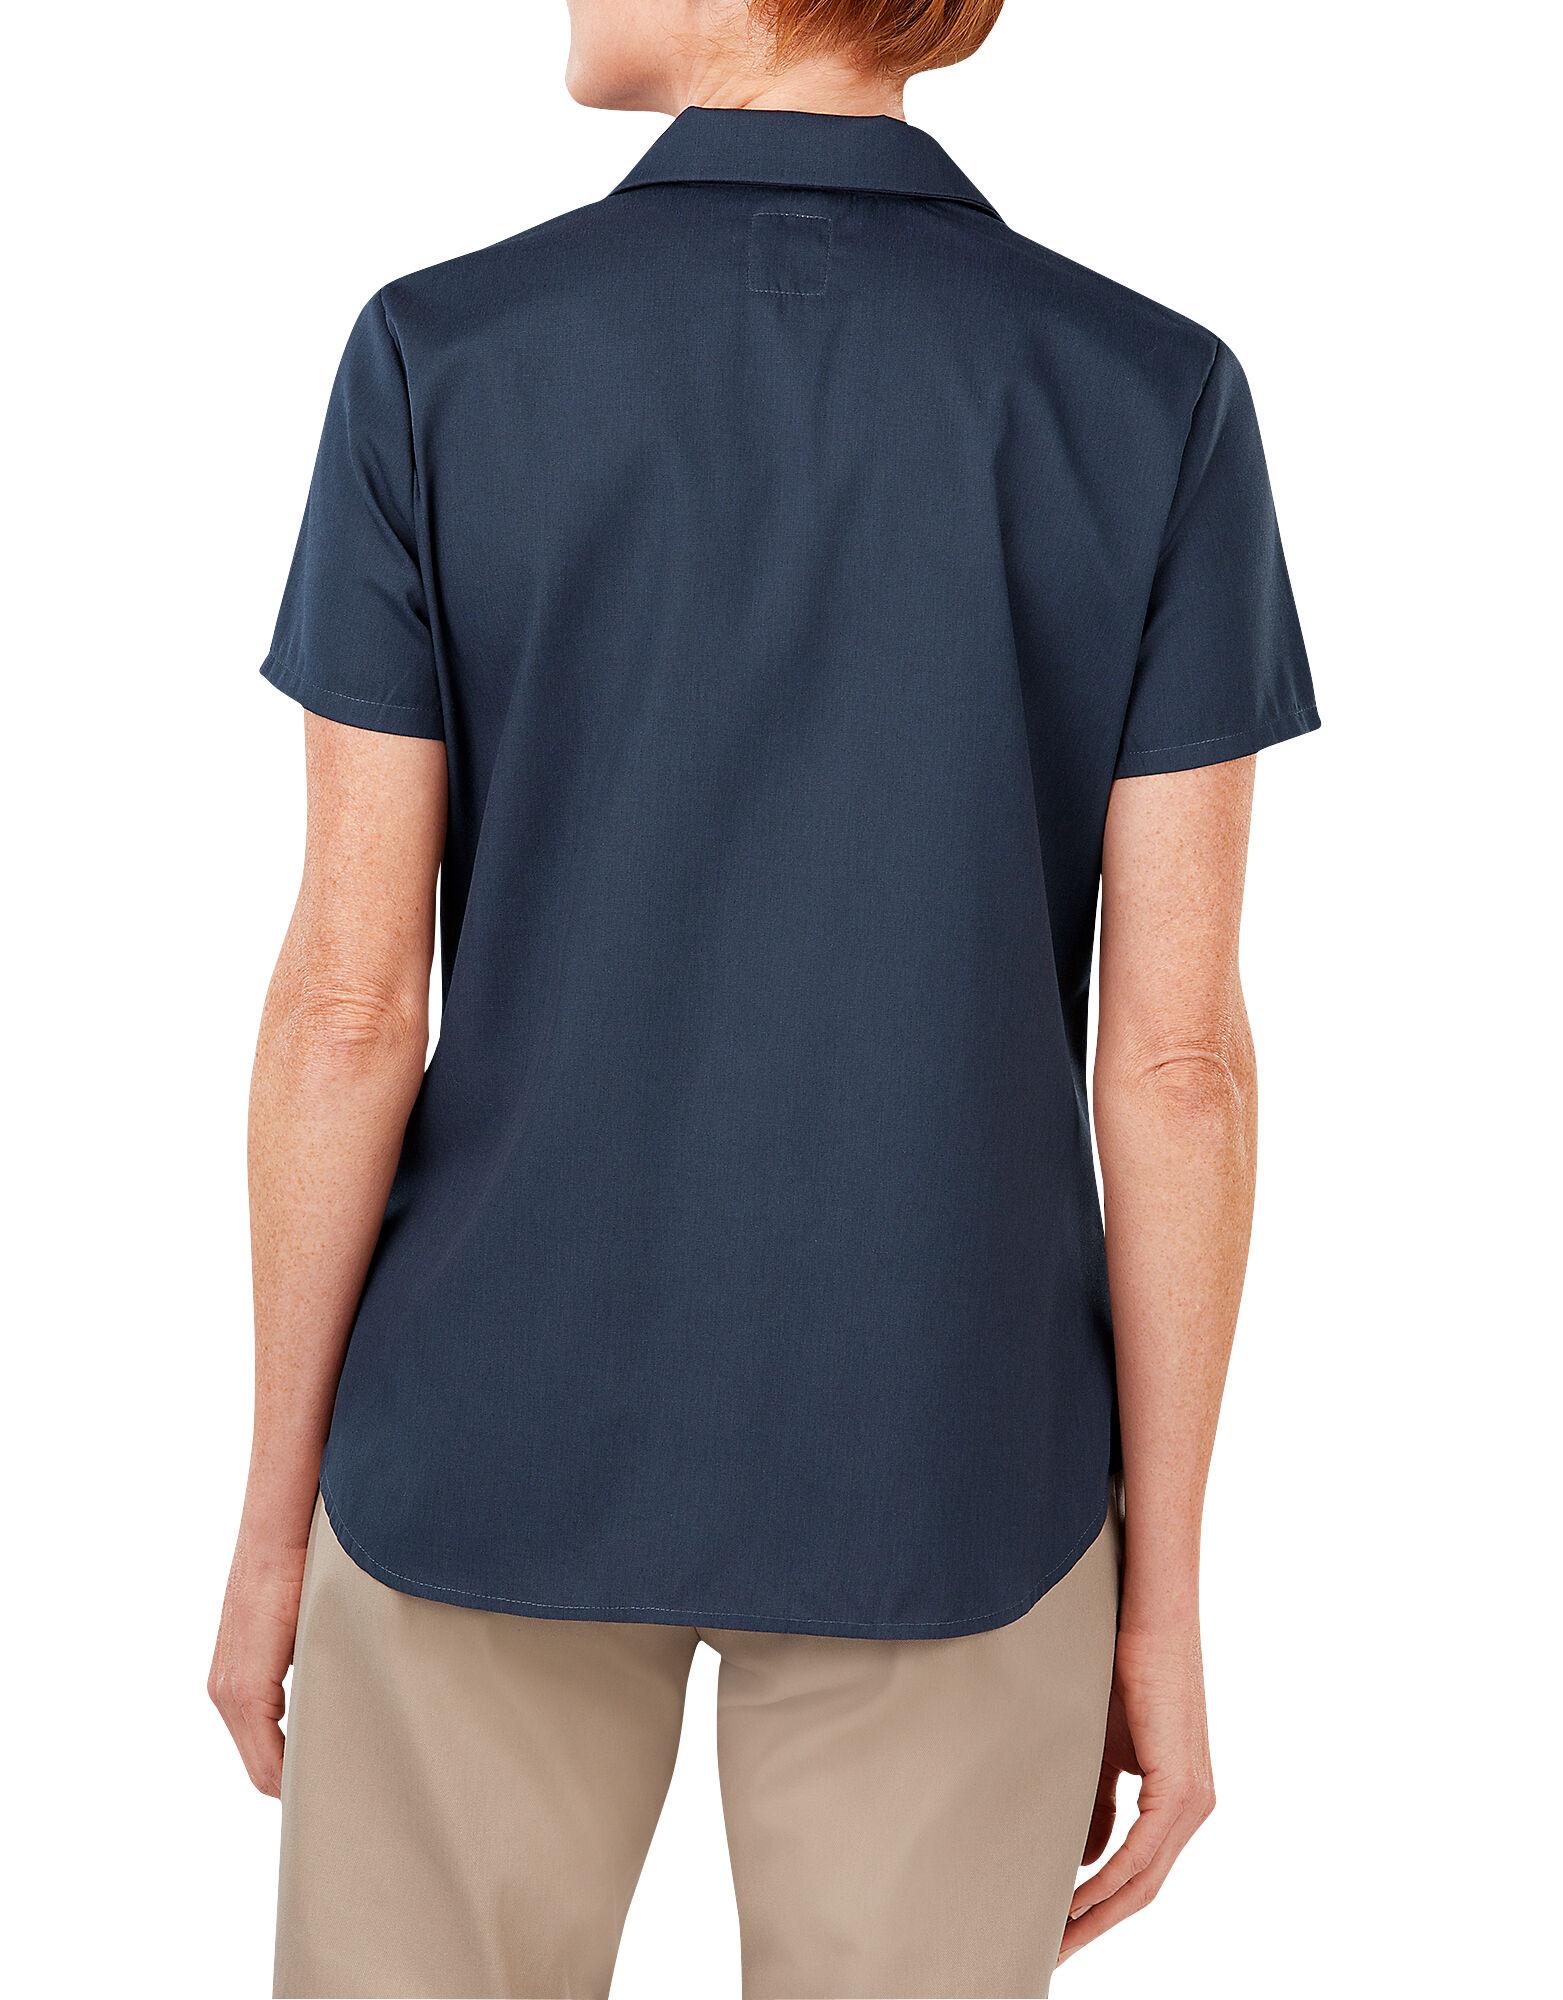 Short Sleeve Industrial Work Shirt Women 39 S Tops Dickies